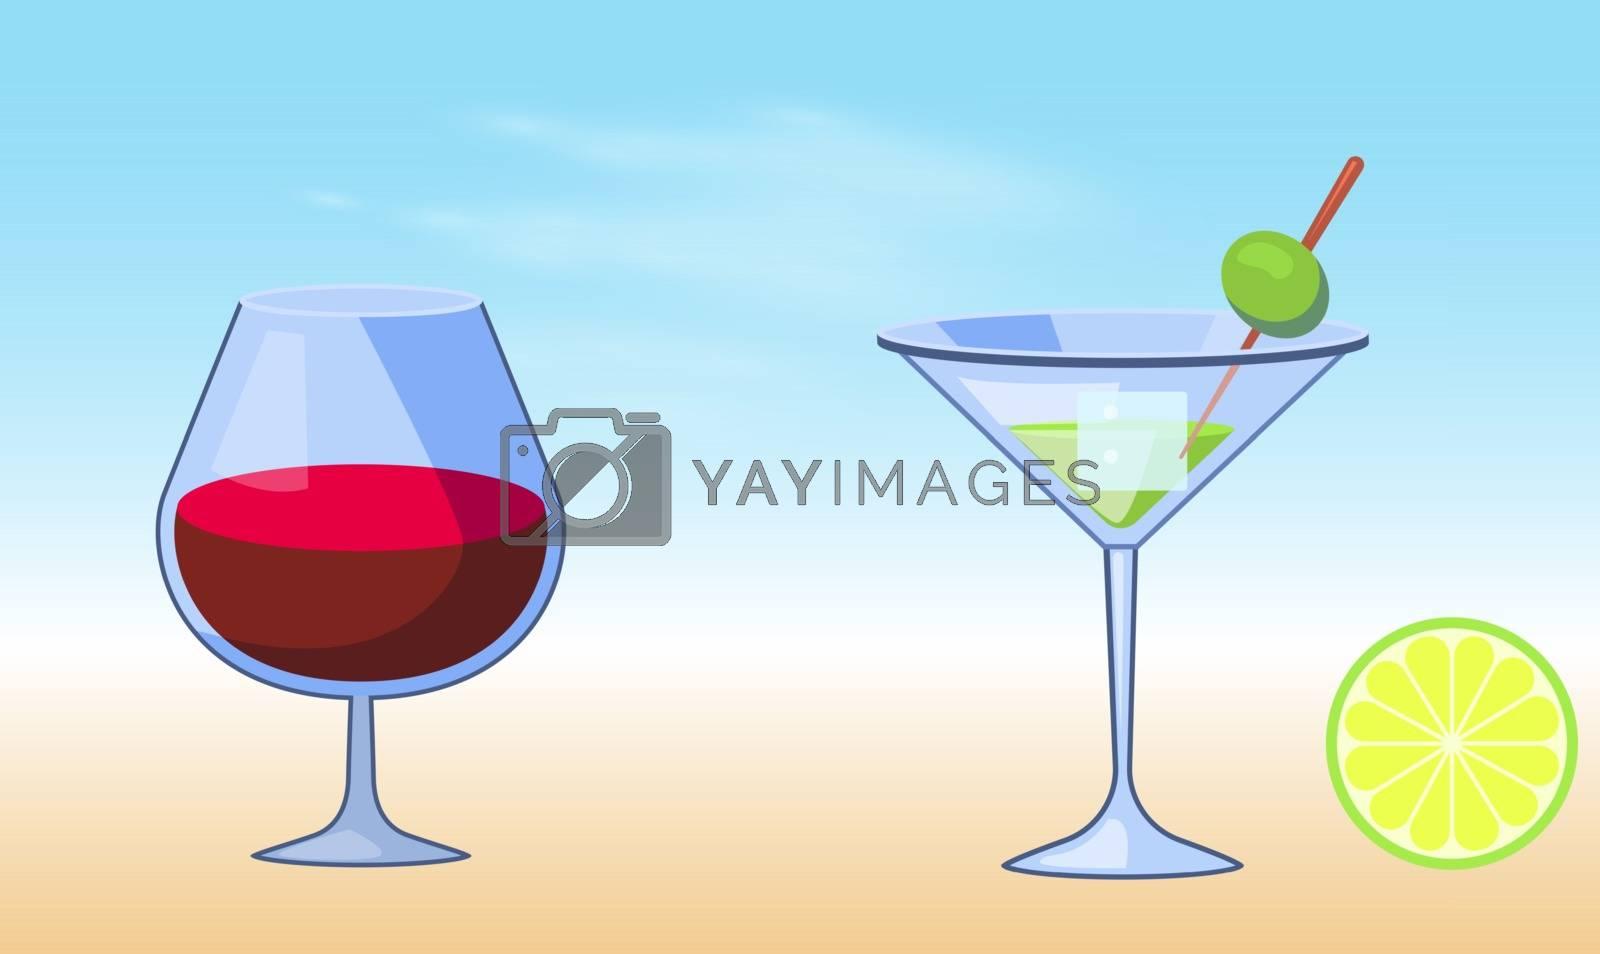 mock up illustration of mocktail glass on abstract background